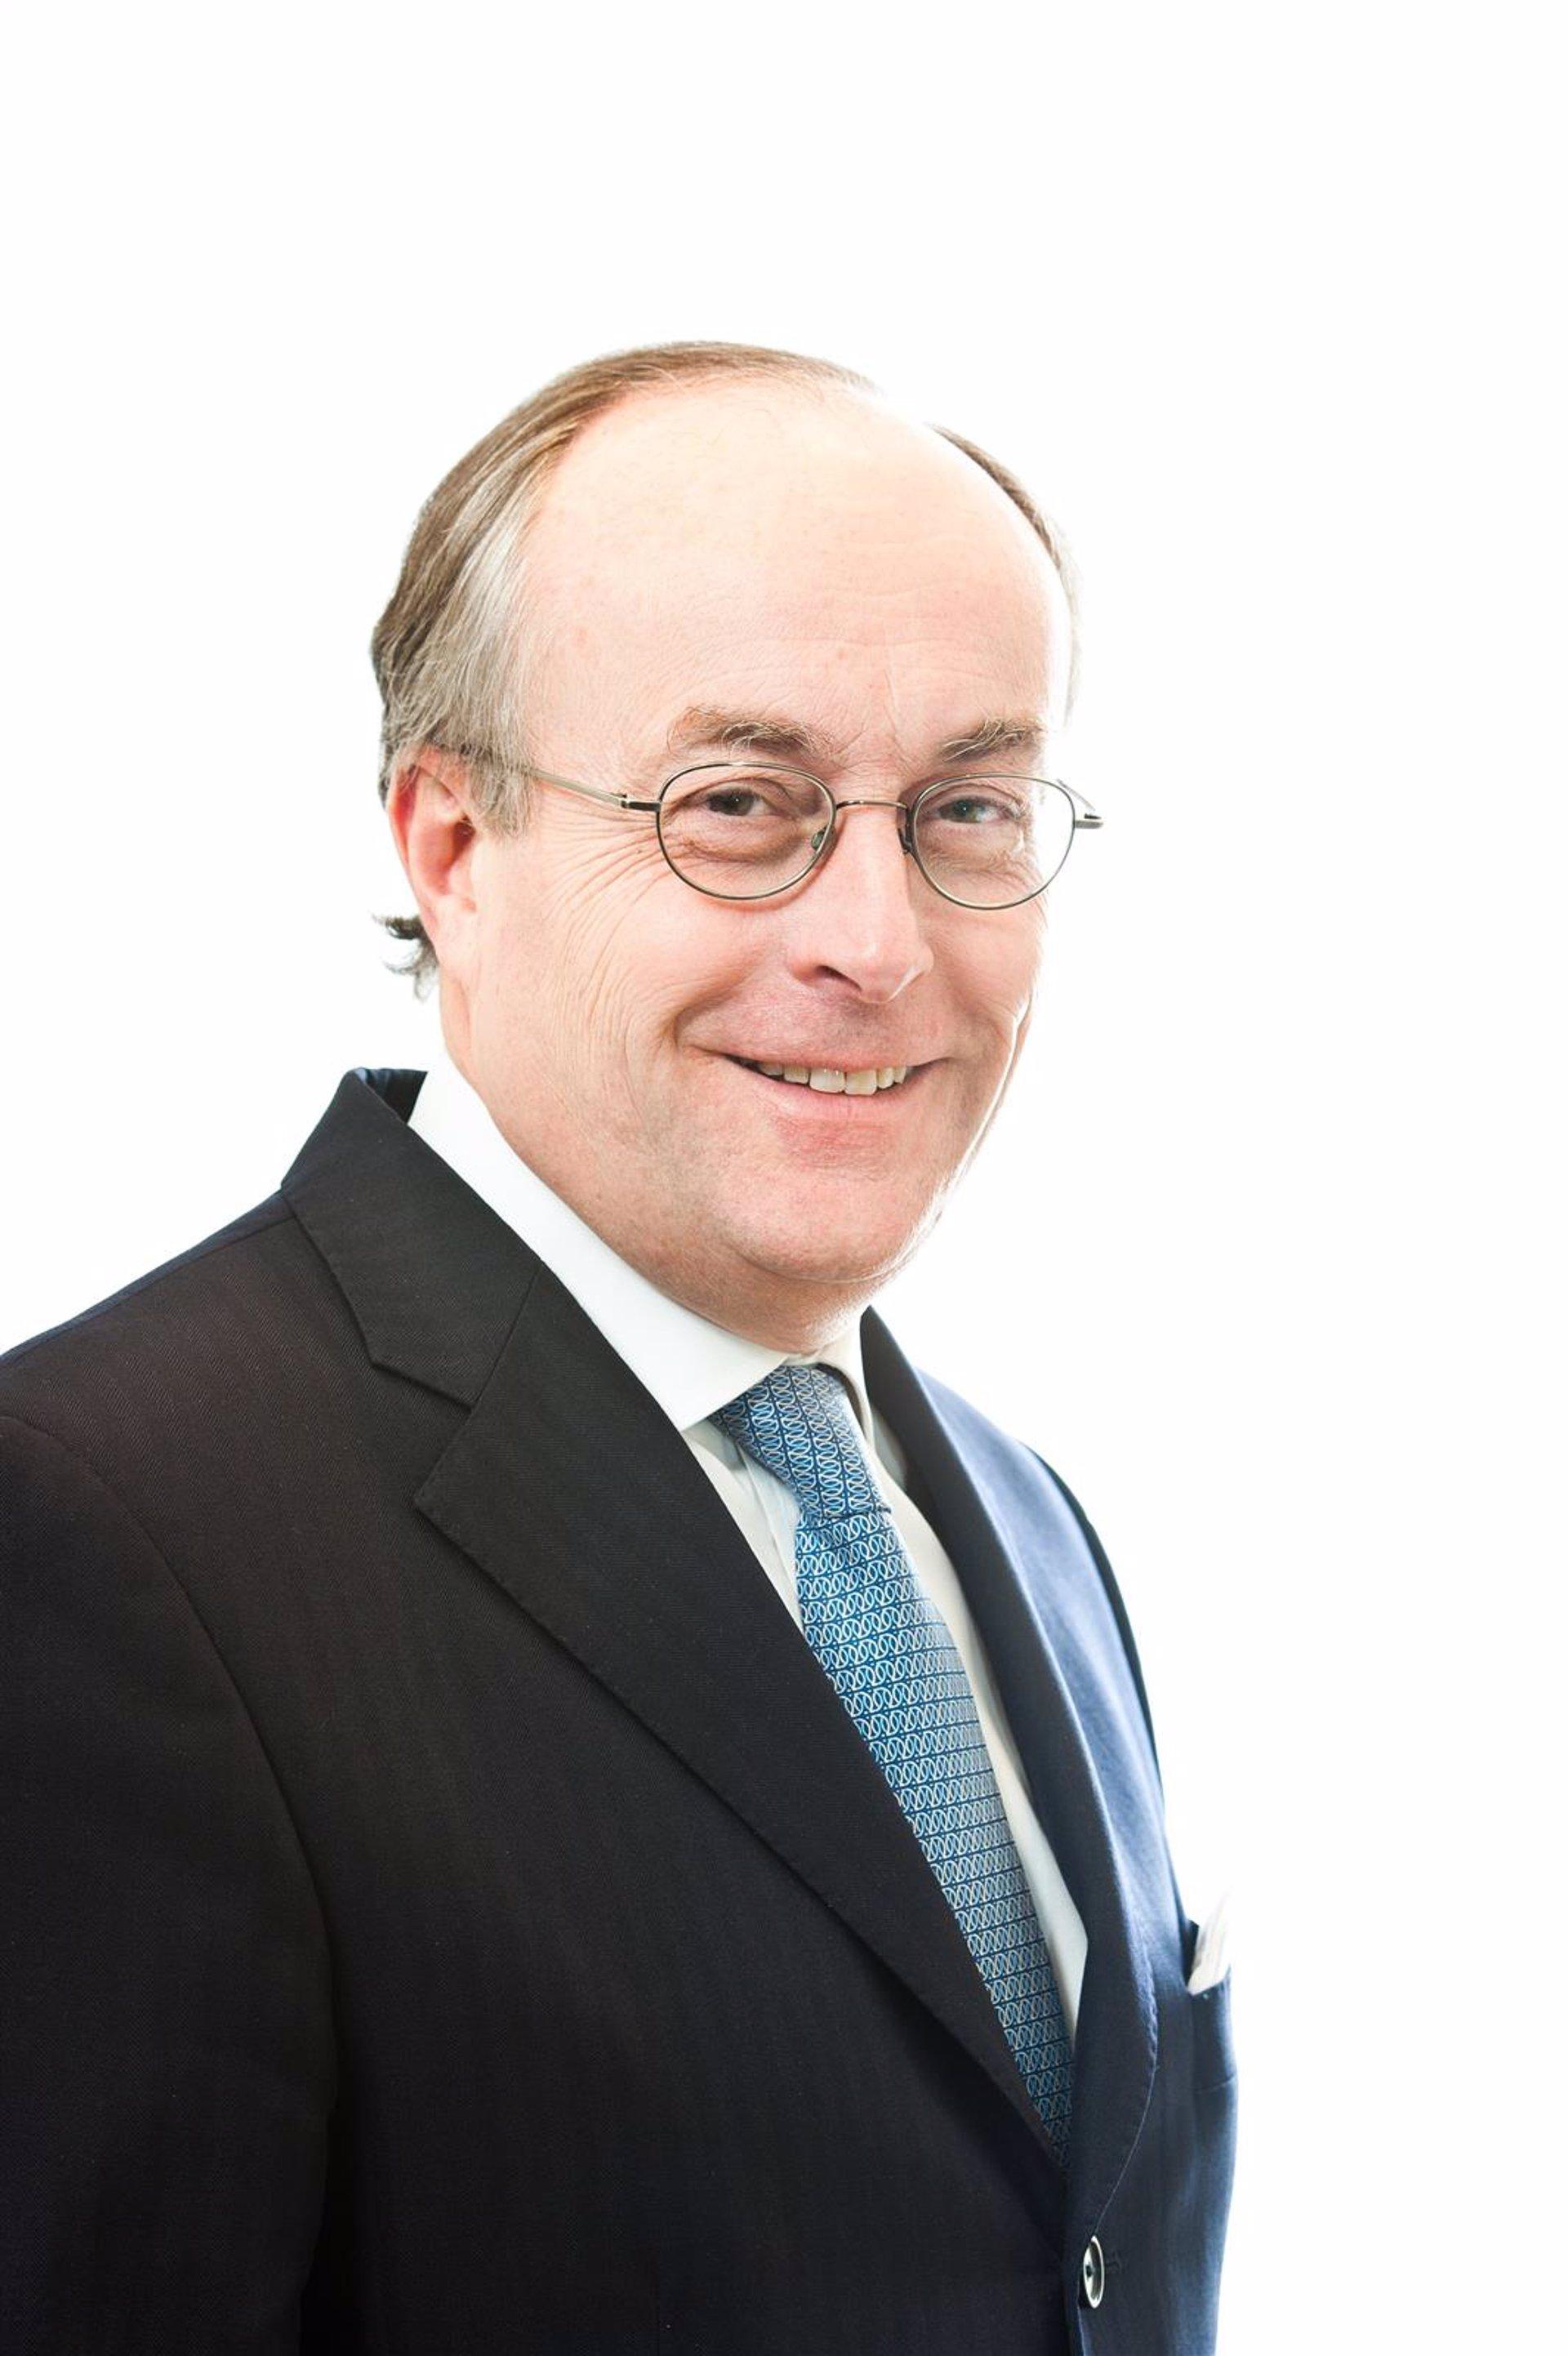 Philippe masset nuevo presidente de privatbank degroof for Oficina ing bilbao